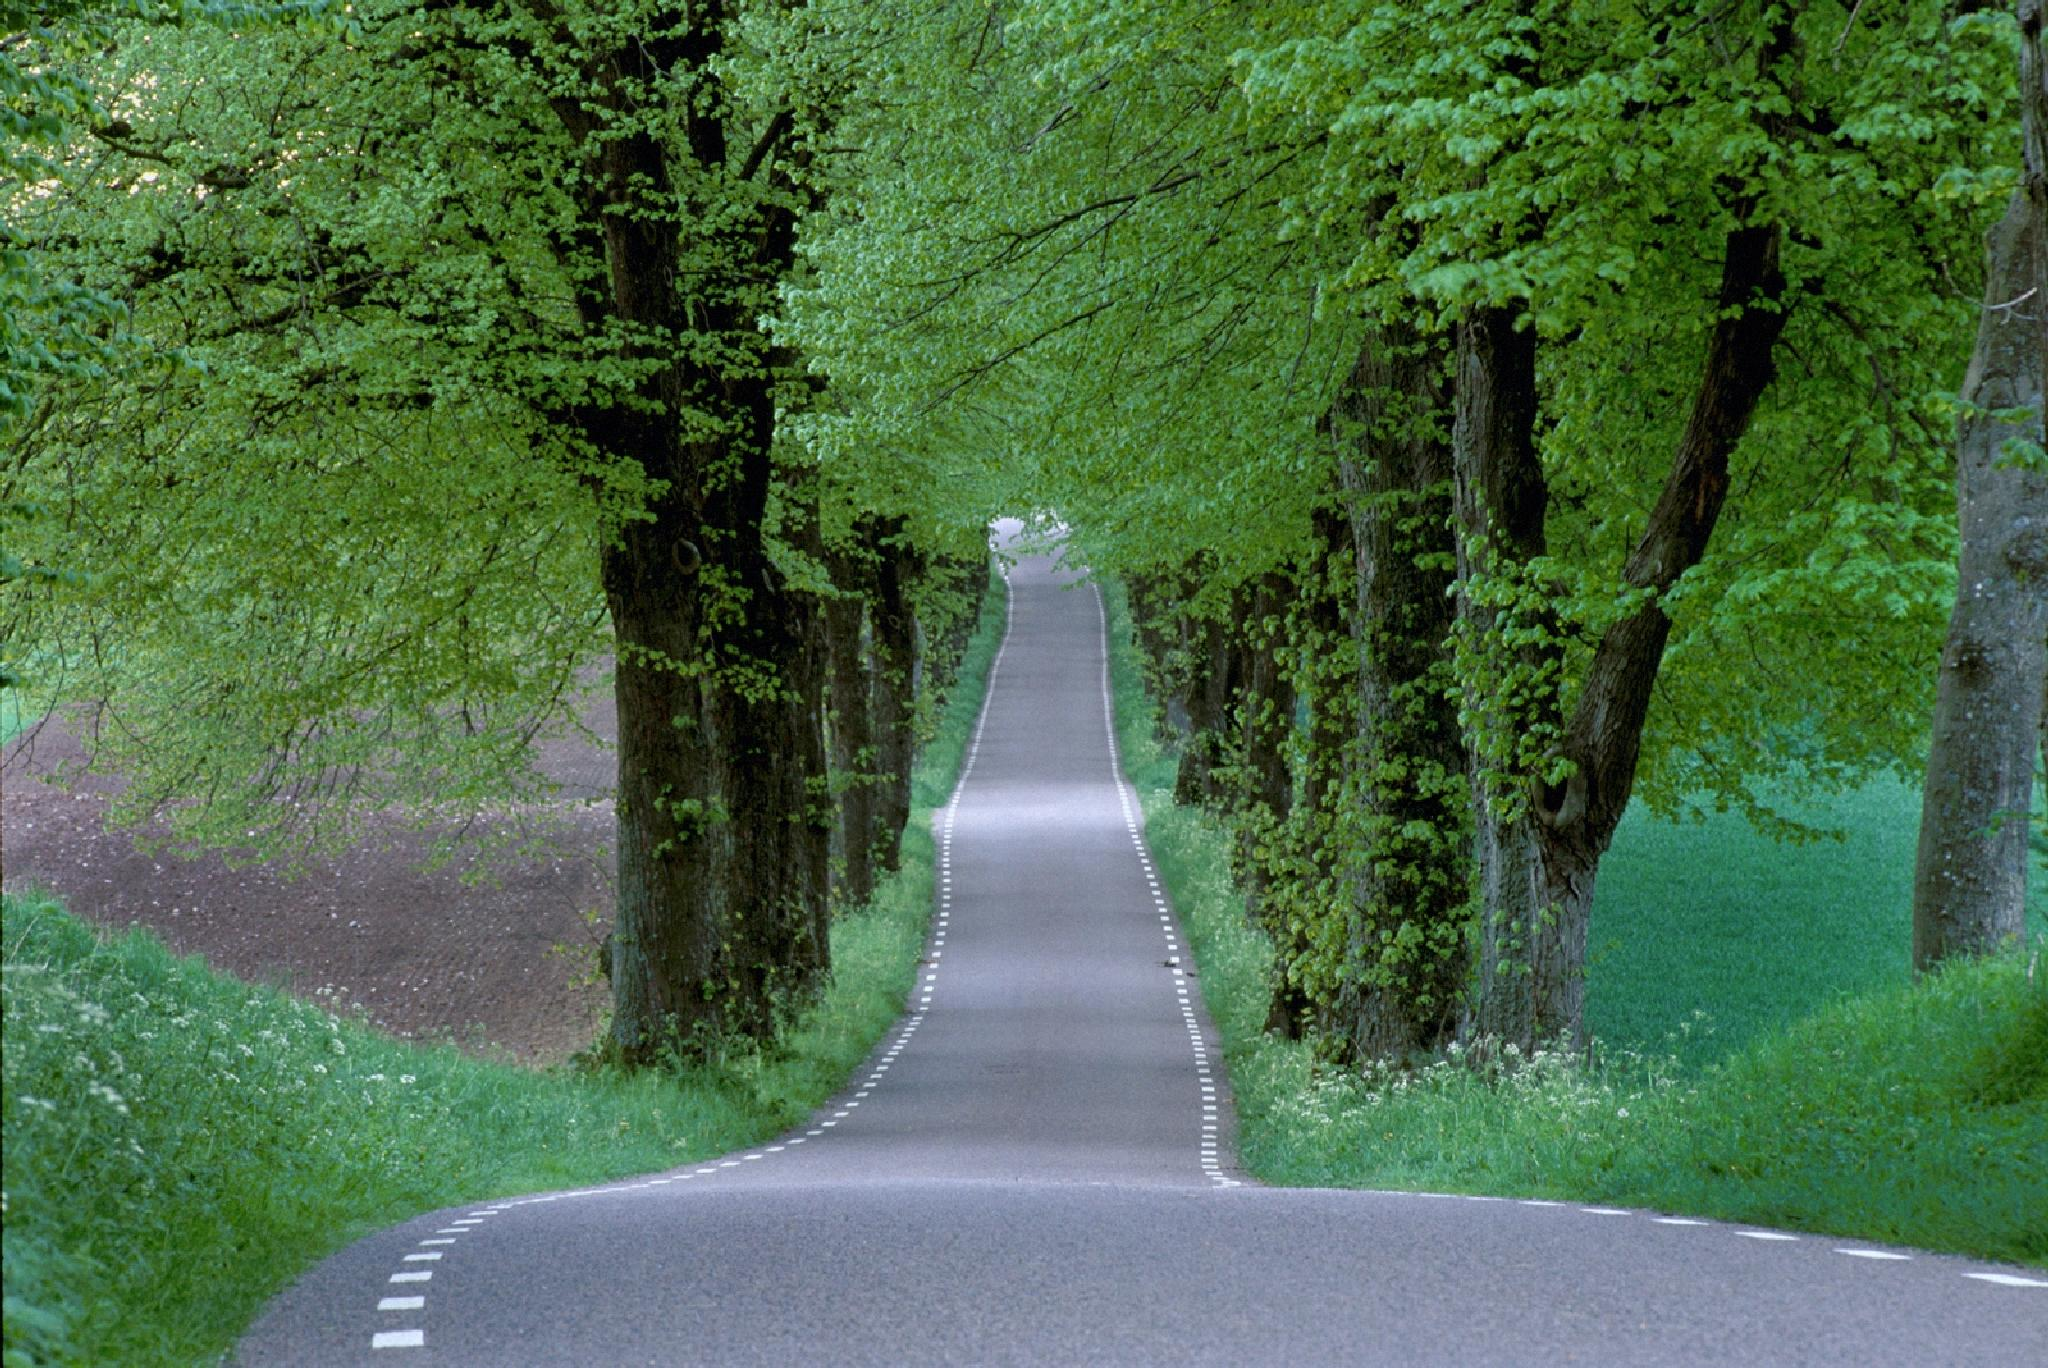 Lime avenue in spring by Göran Gustafson